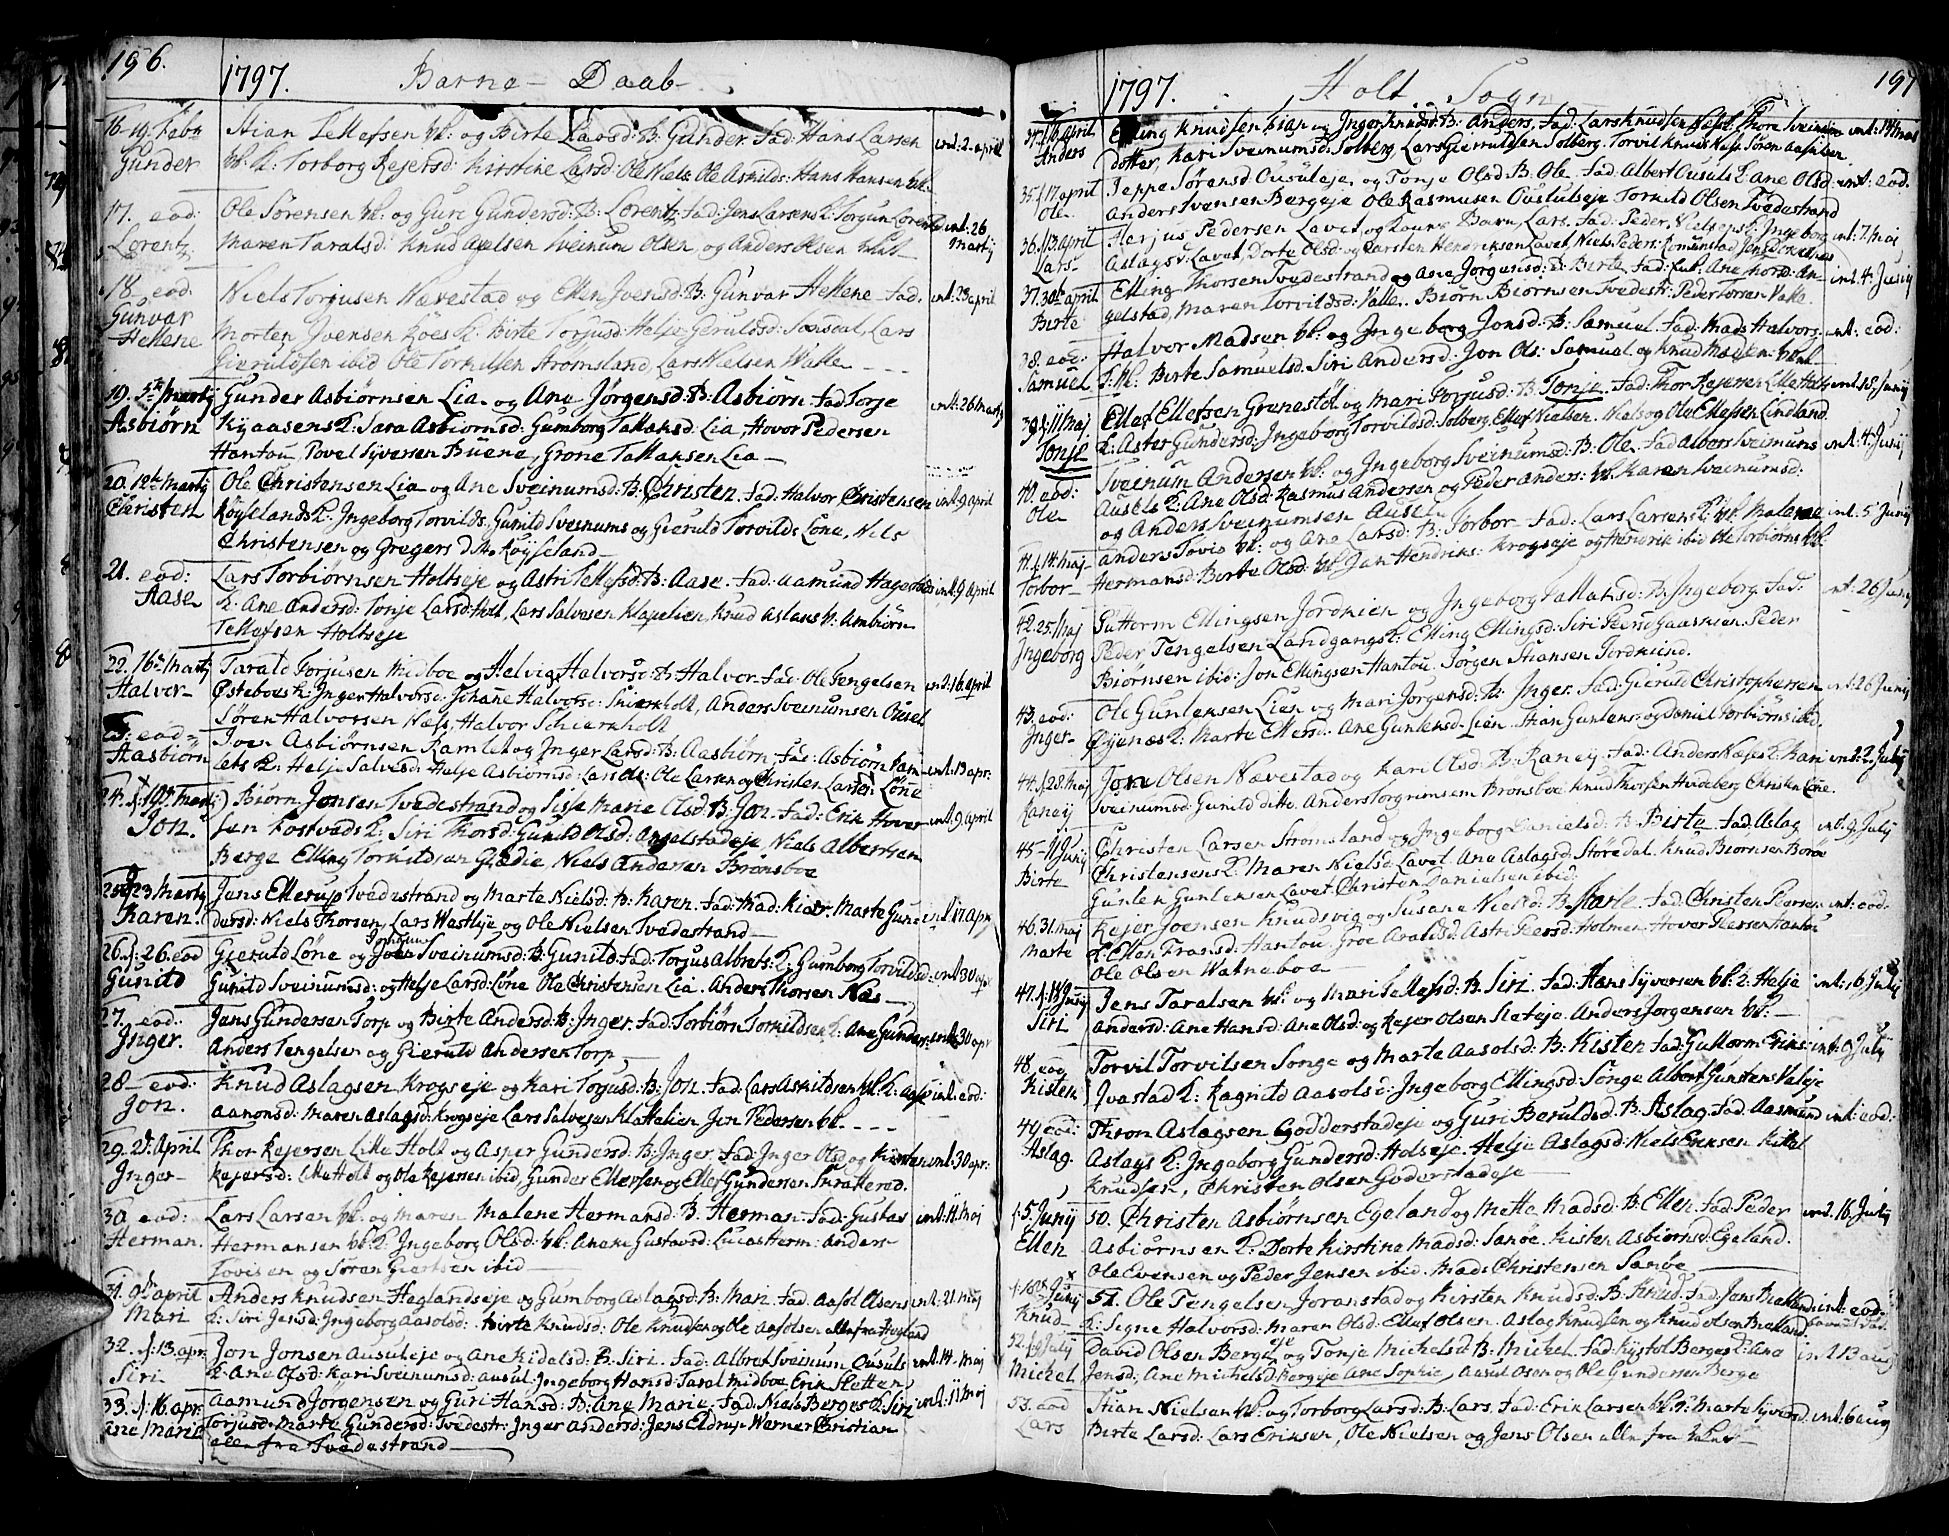 SAK, Holt sokneprestkontor, F/Fa/L0003: Ministerialbok nr. A 3, 1765-1798, s. 196-197